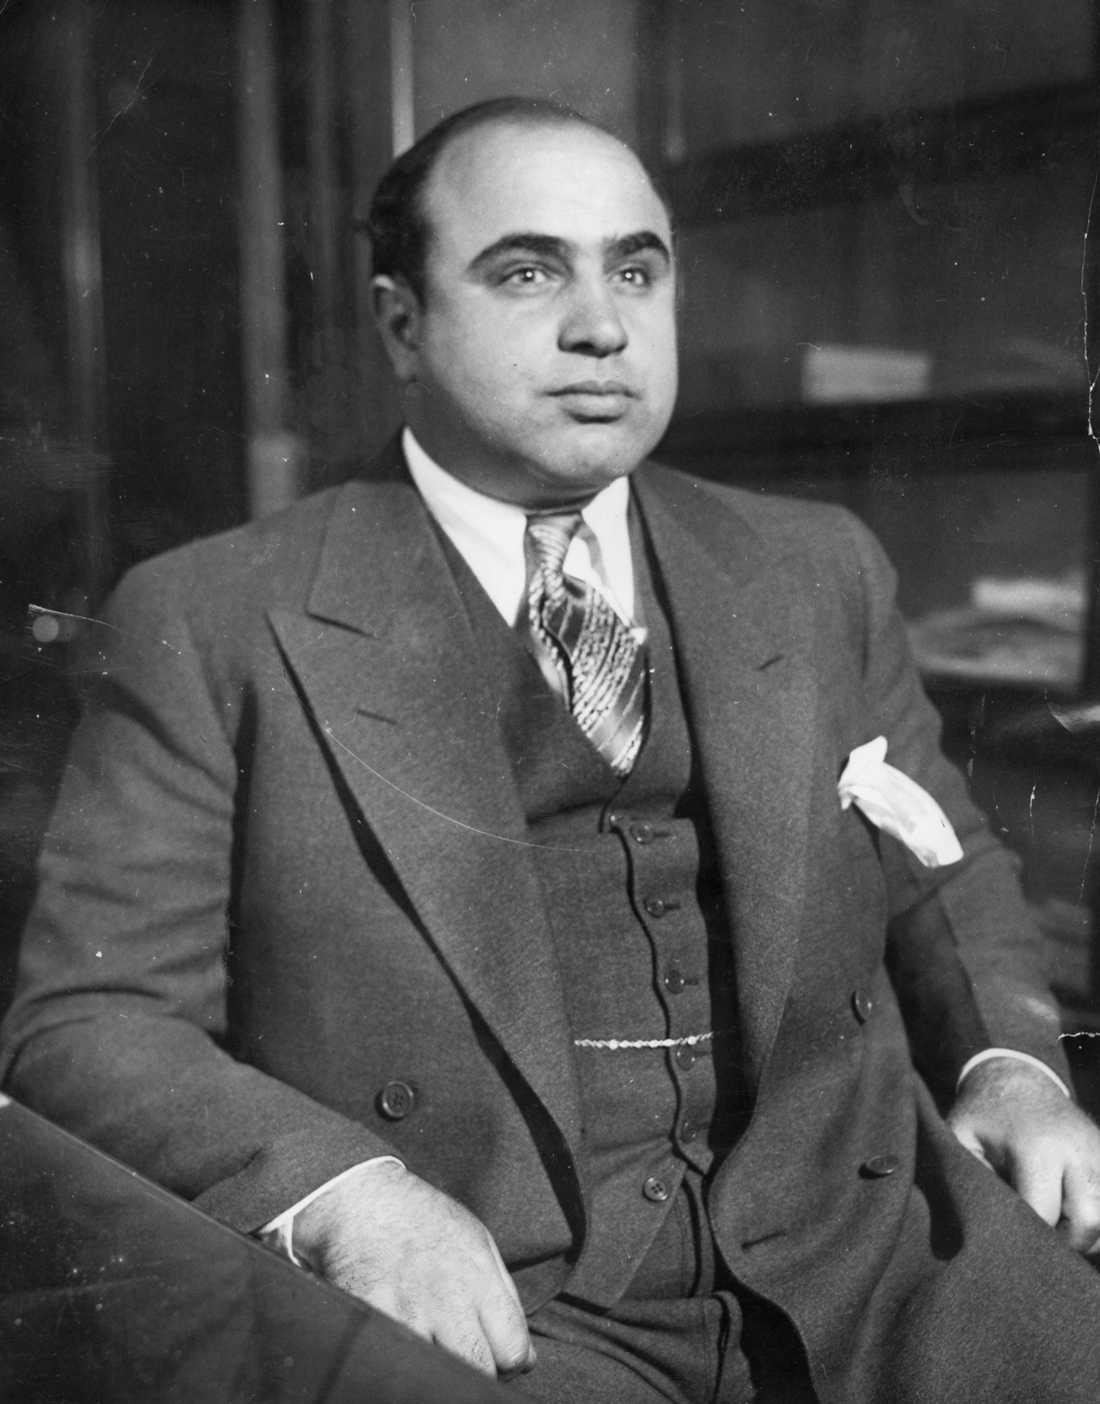 Den verklige Al Capone 1930.